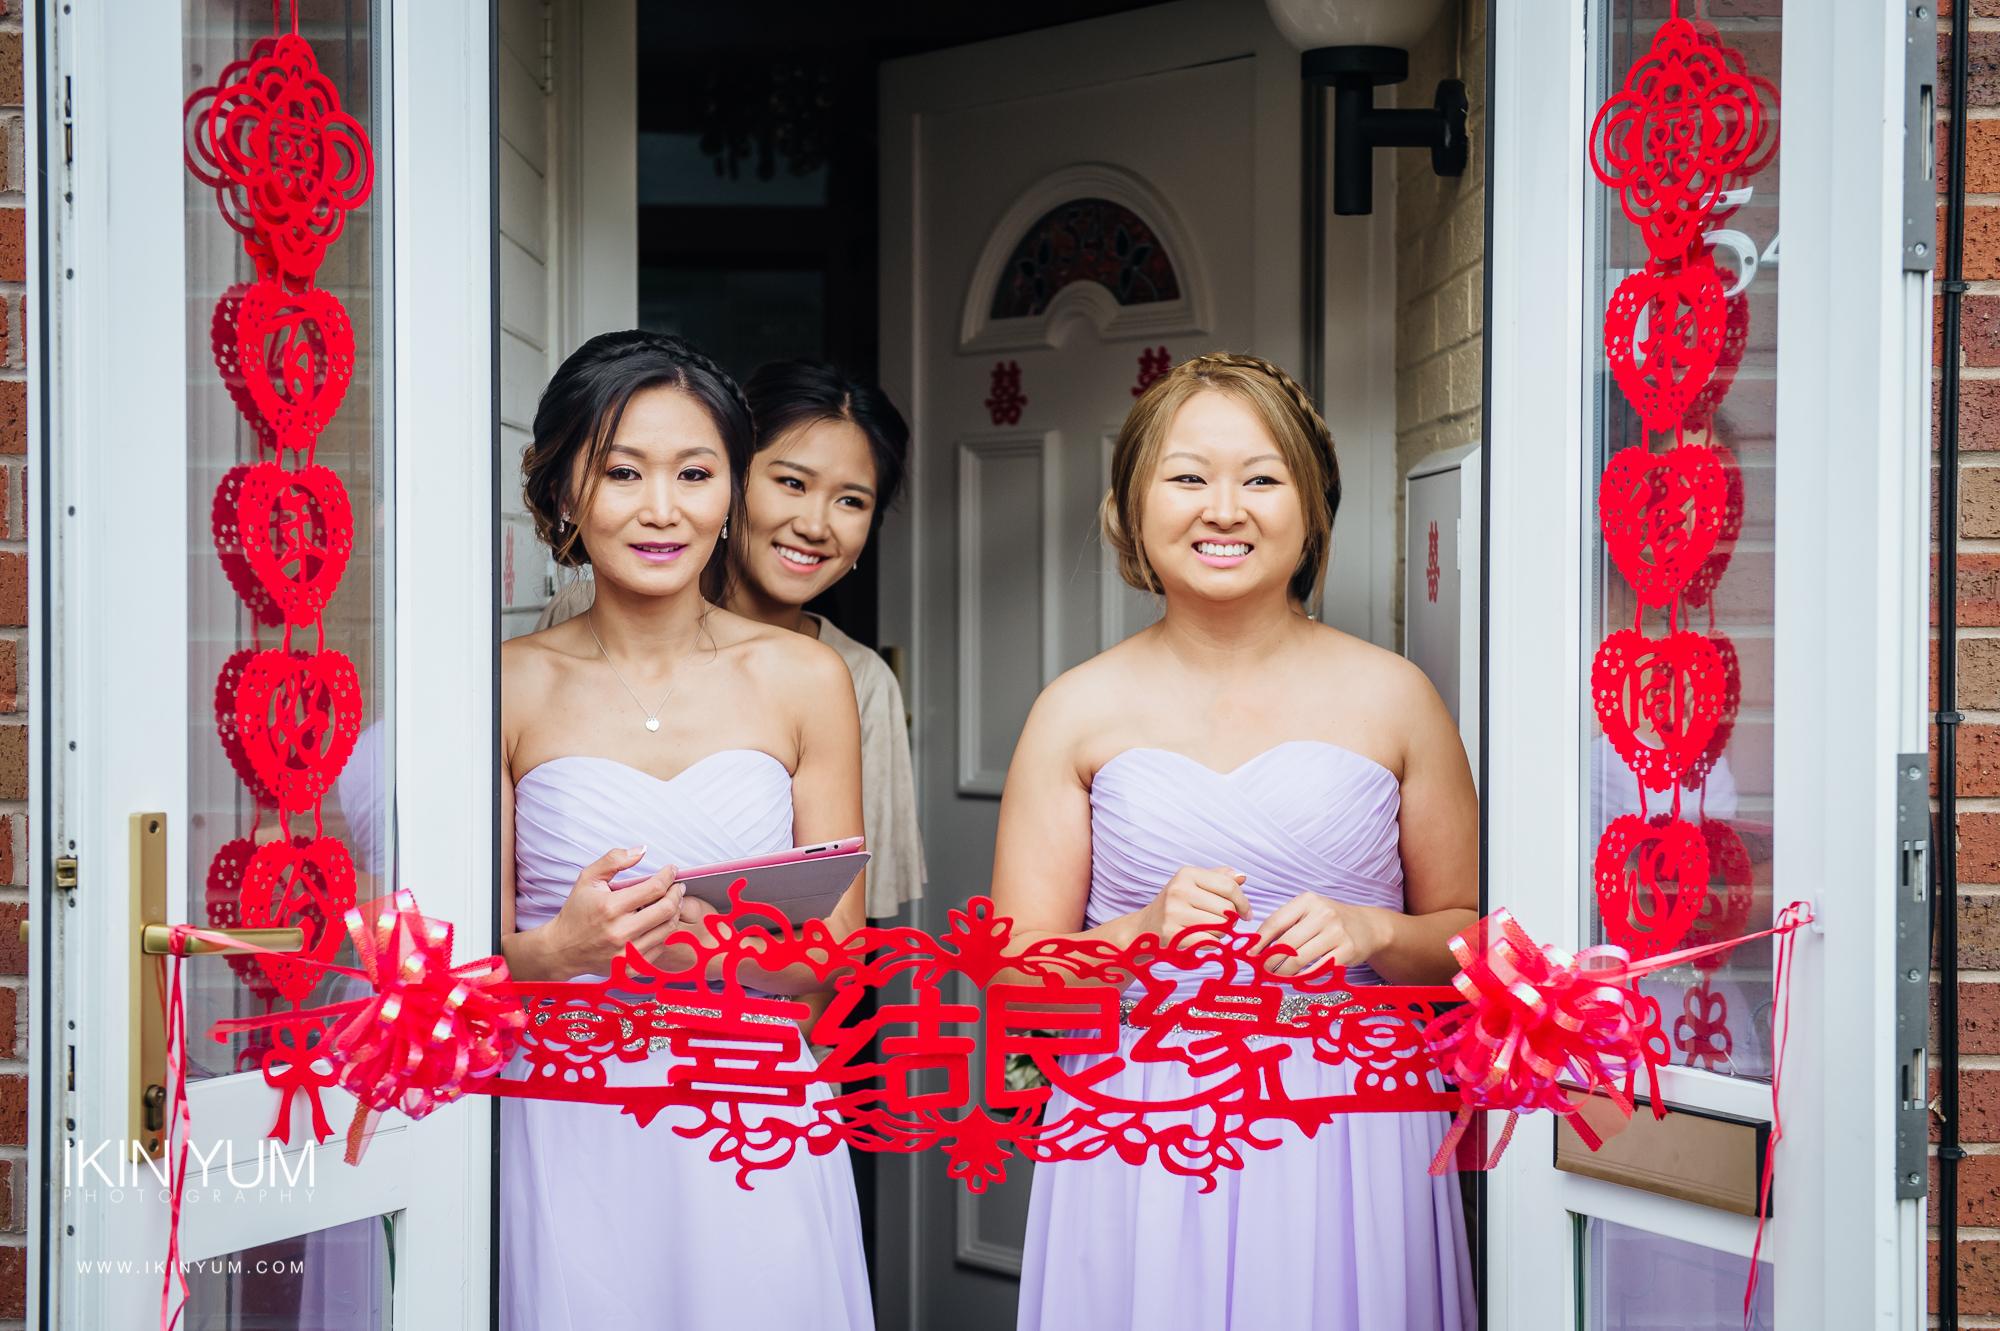 Hampton Manor Wedding - Ikin Yum Photography -022.jpg